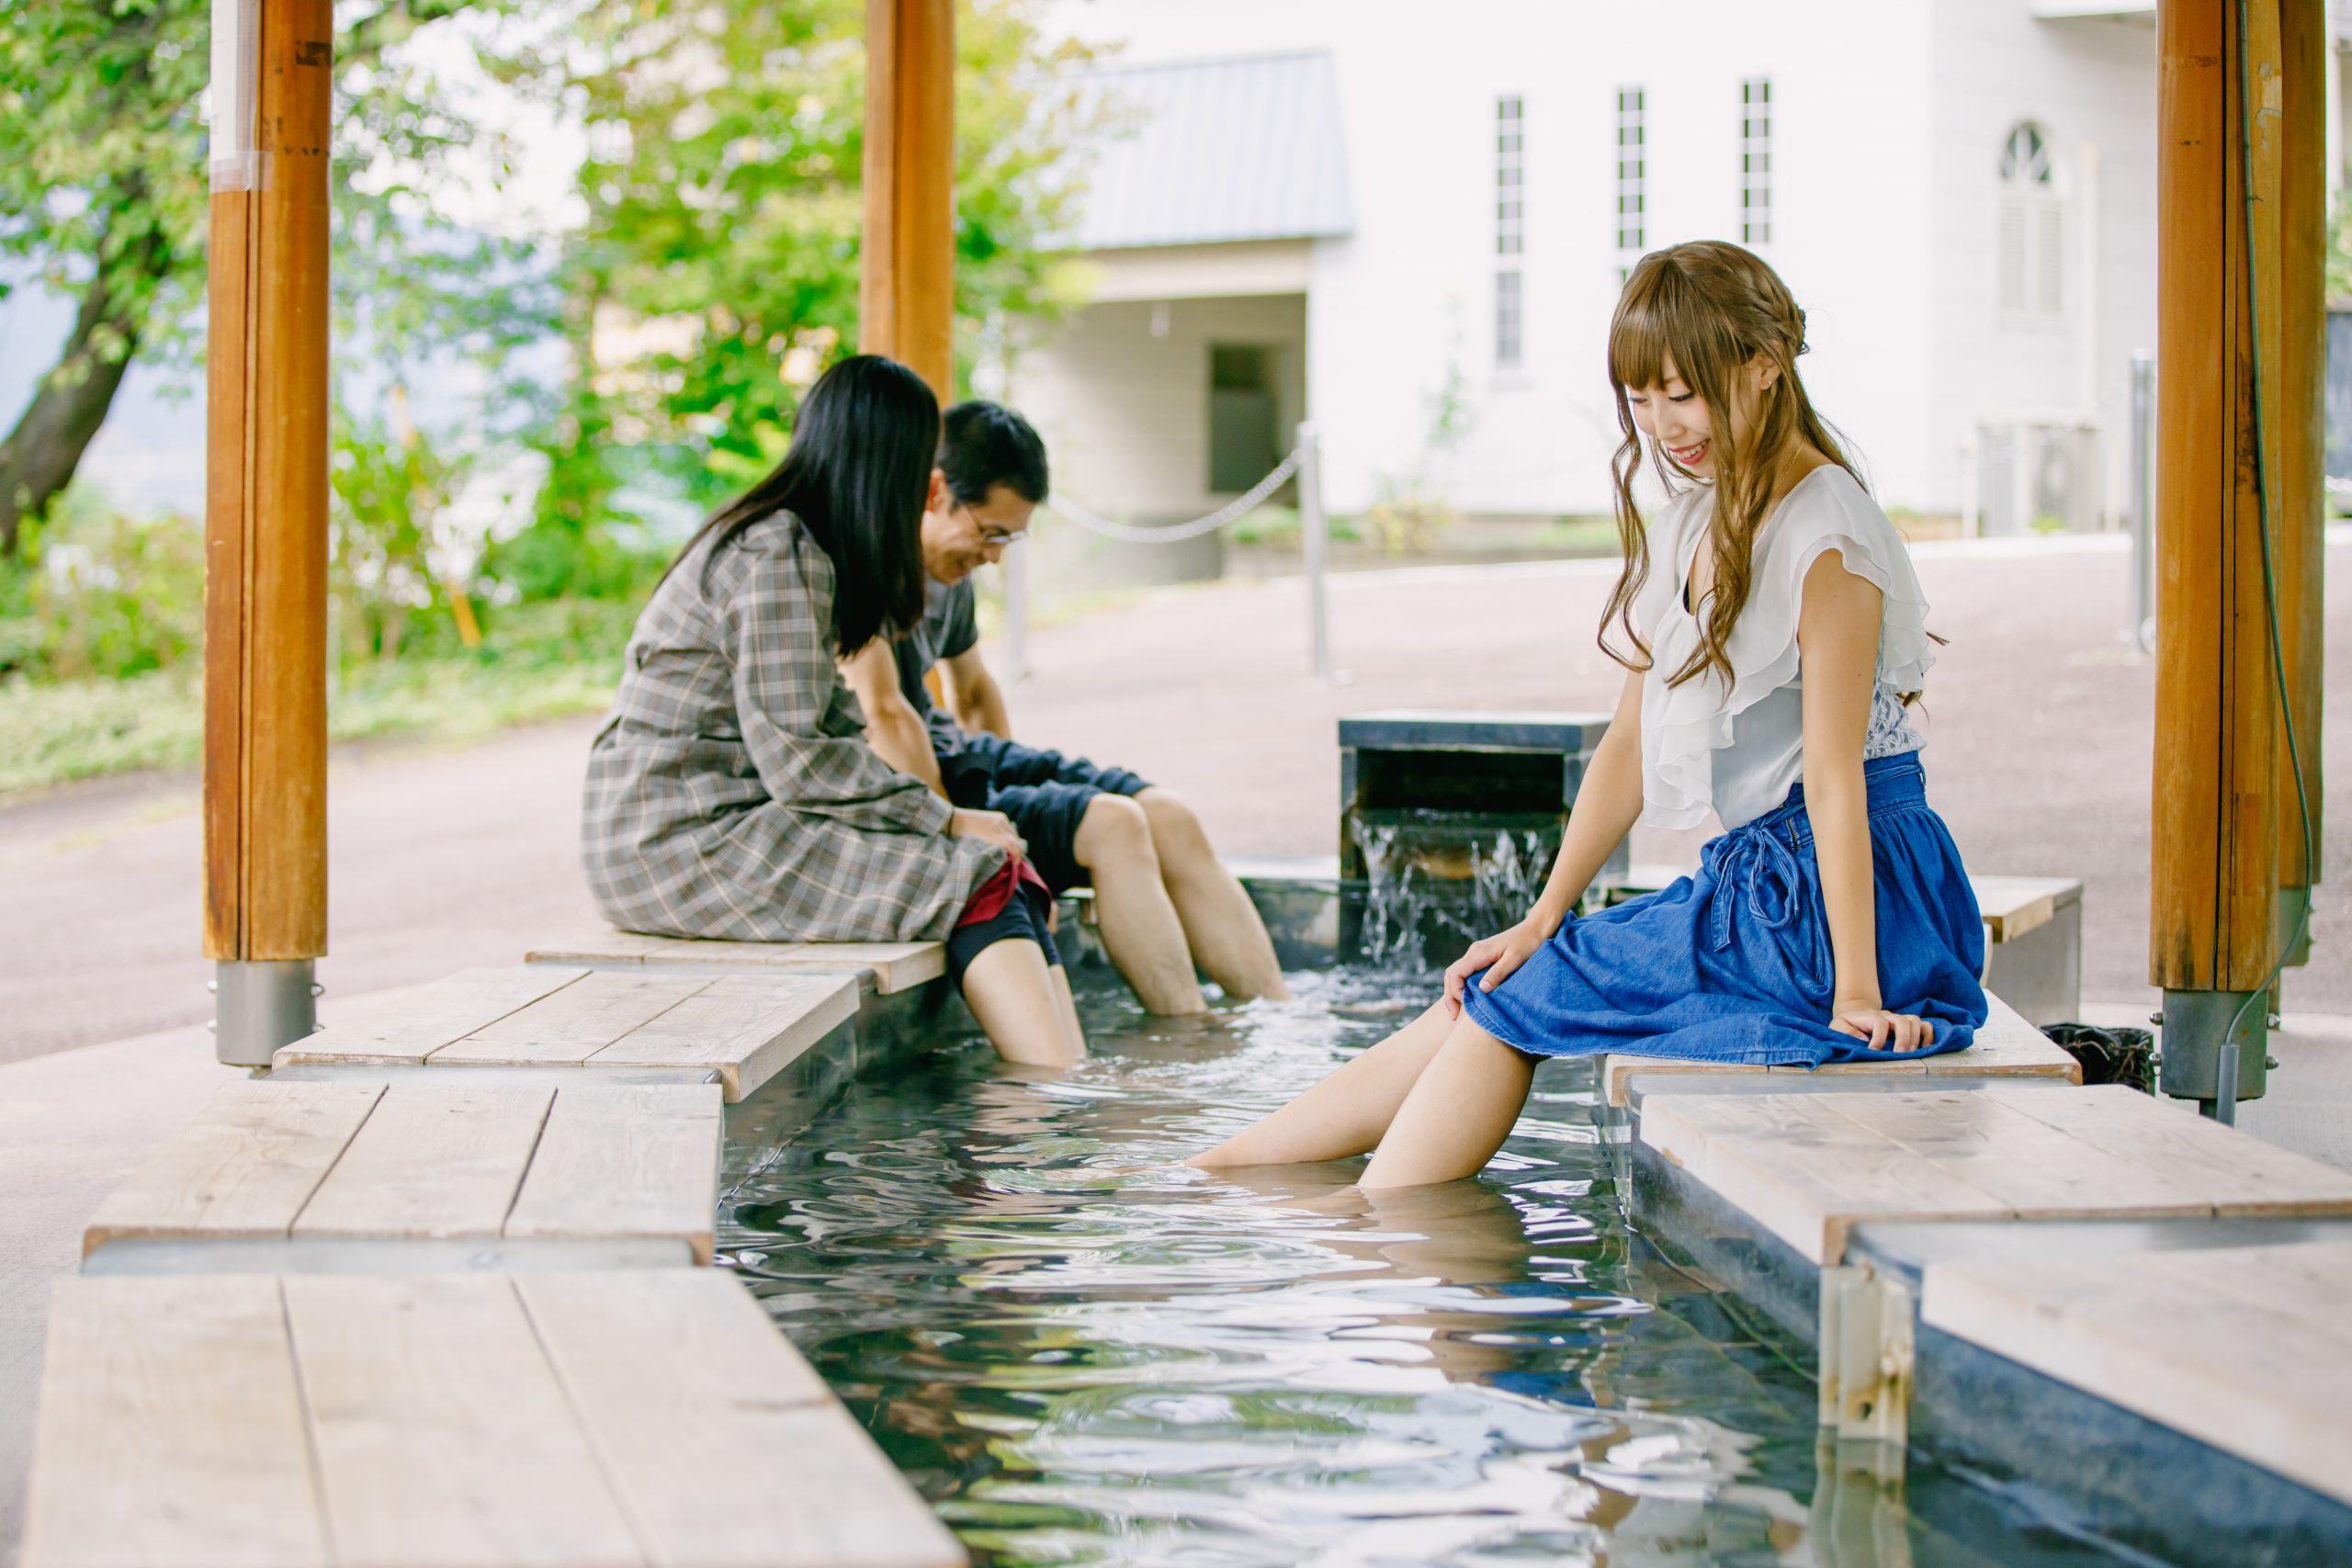 kaede-no-yu-yudanaka-onsen-foot-spa